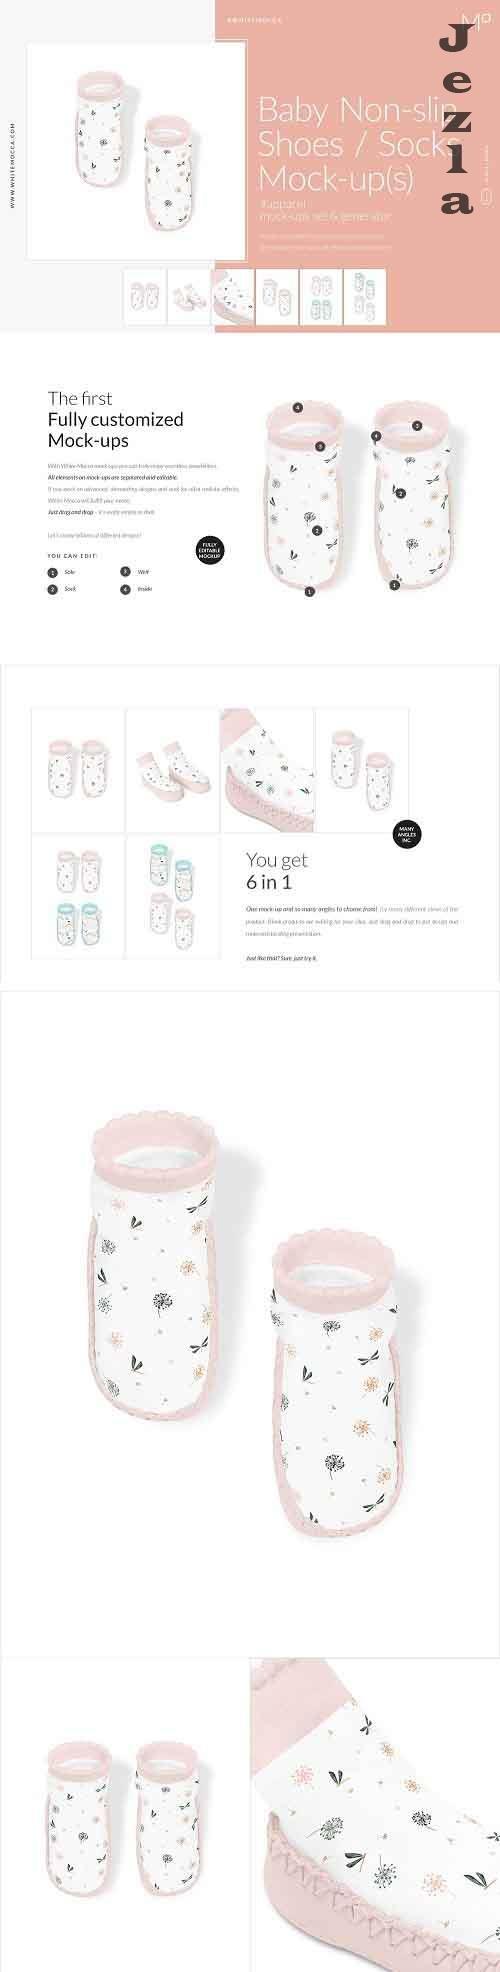 CreativeMarket - Baby Non-slip Shoes / Socks Mock-ups 4548189